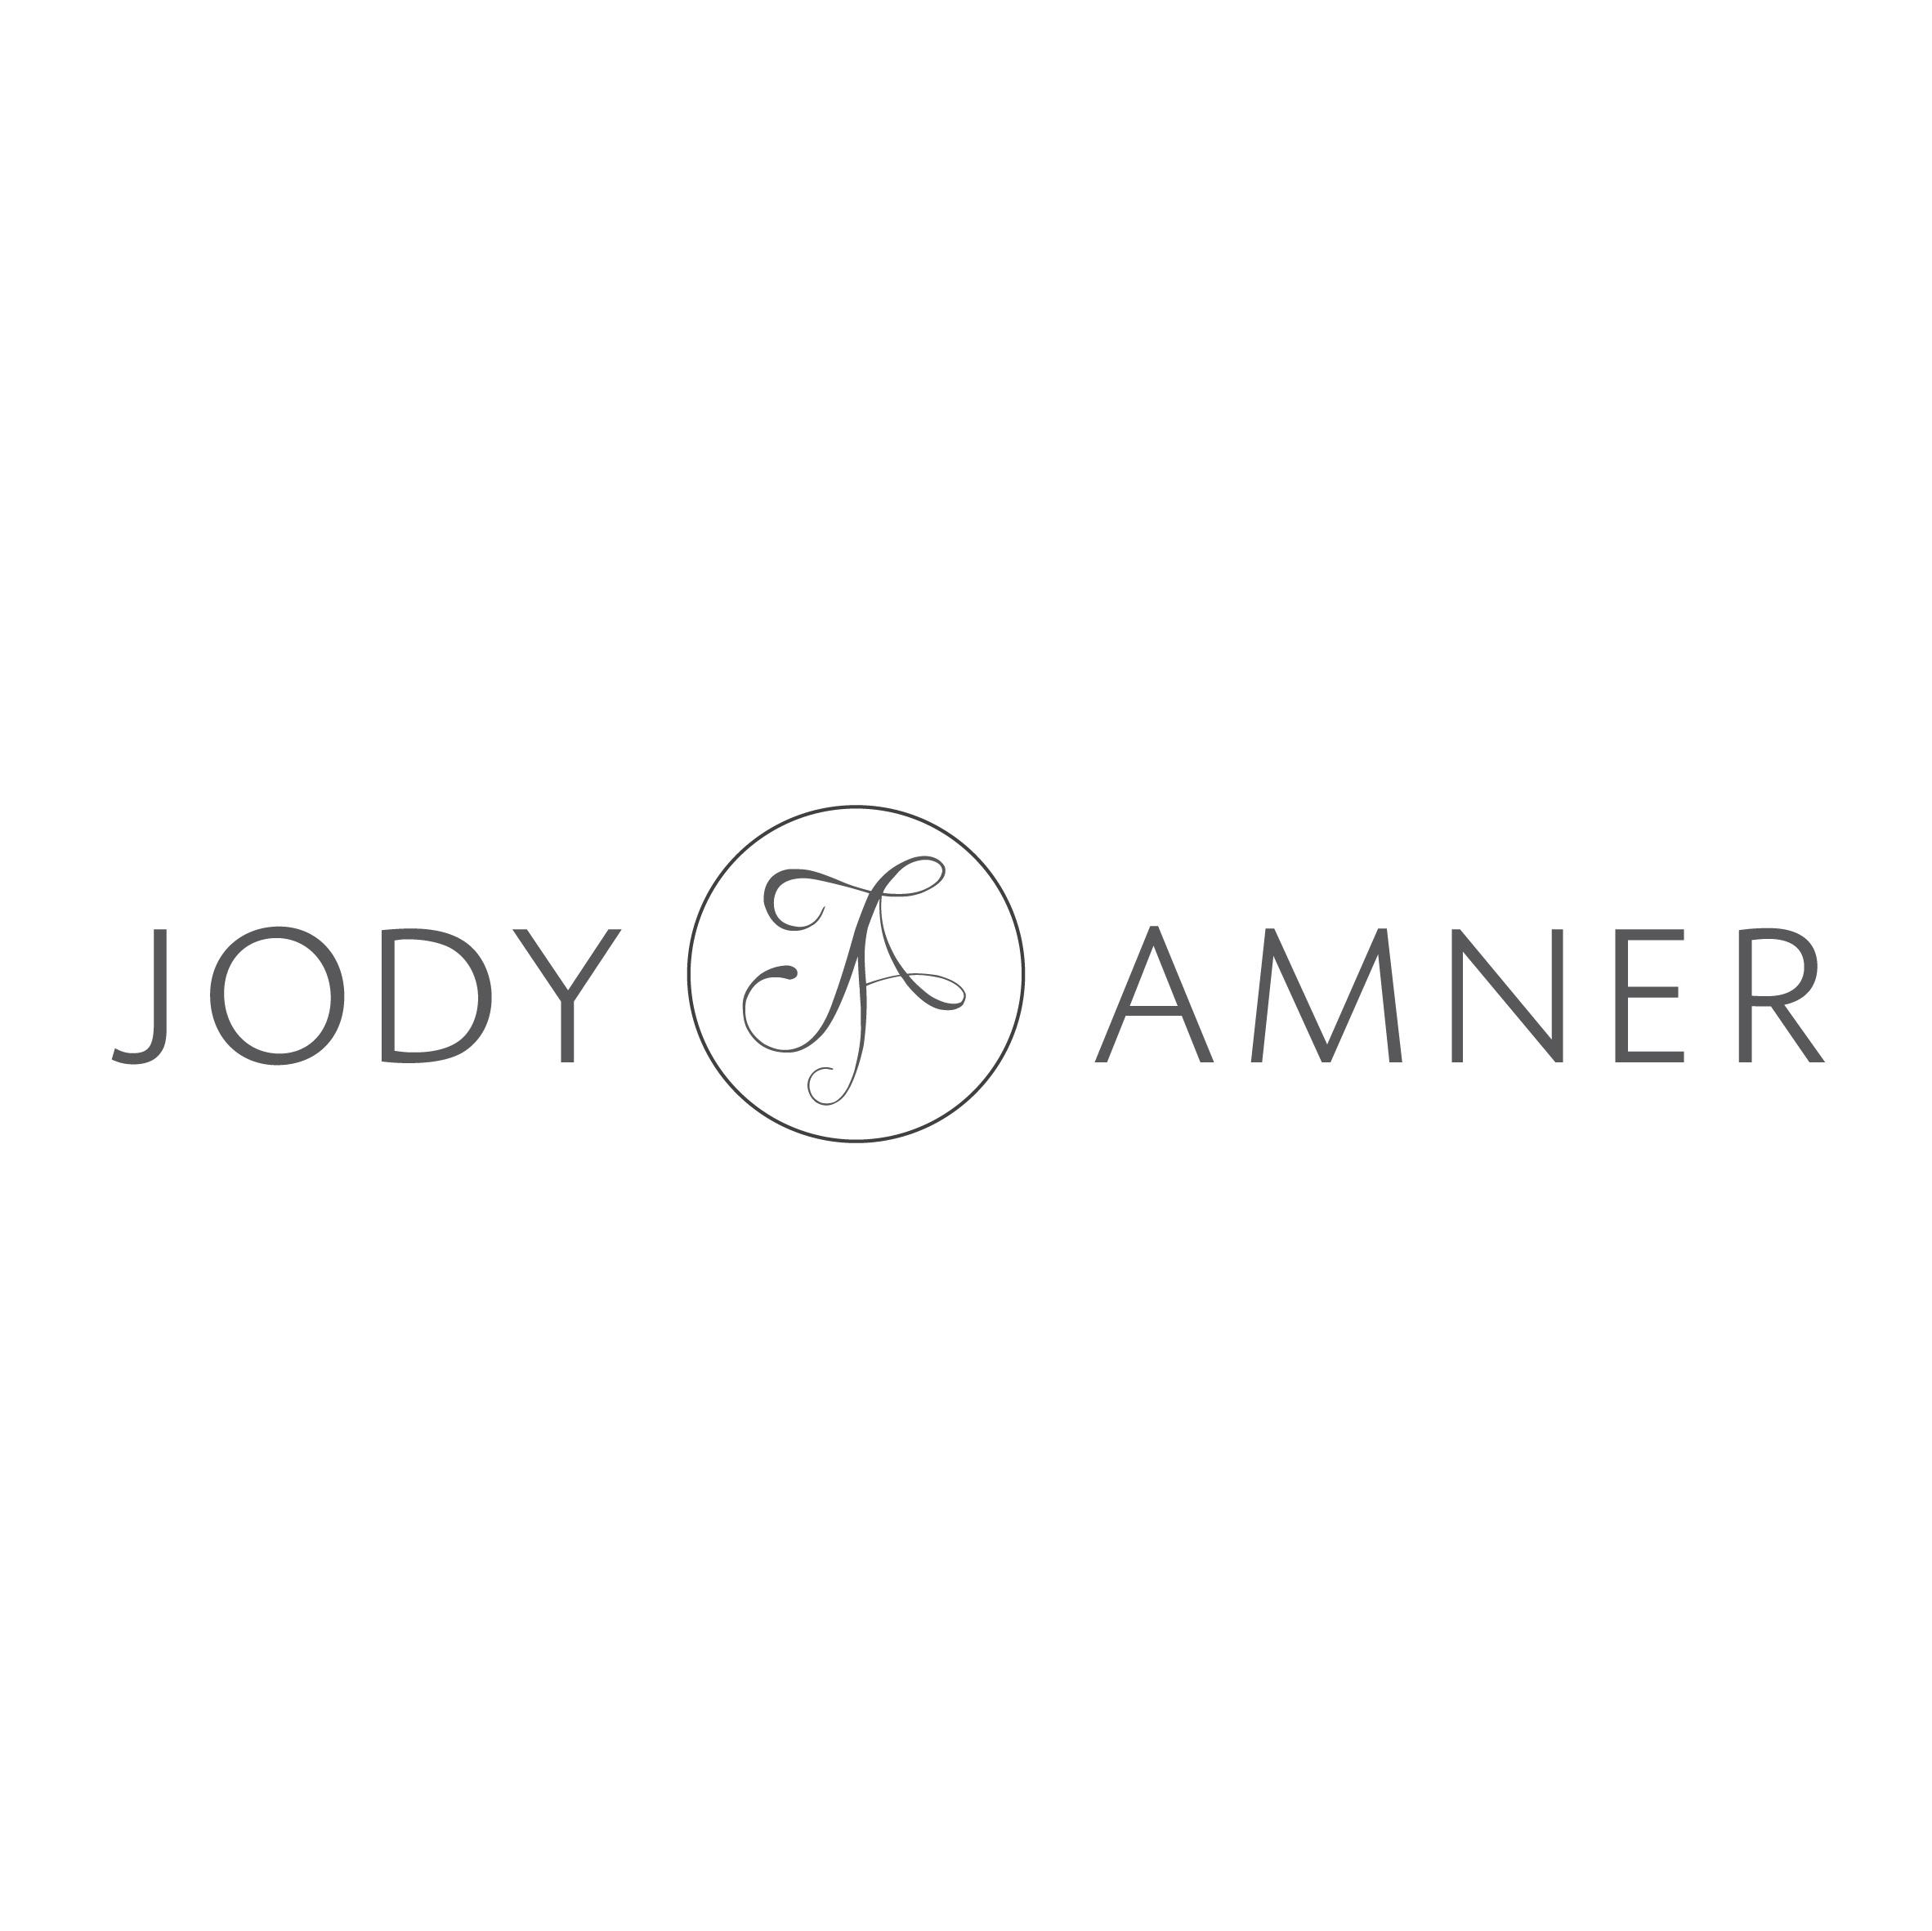 Jody Amner